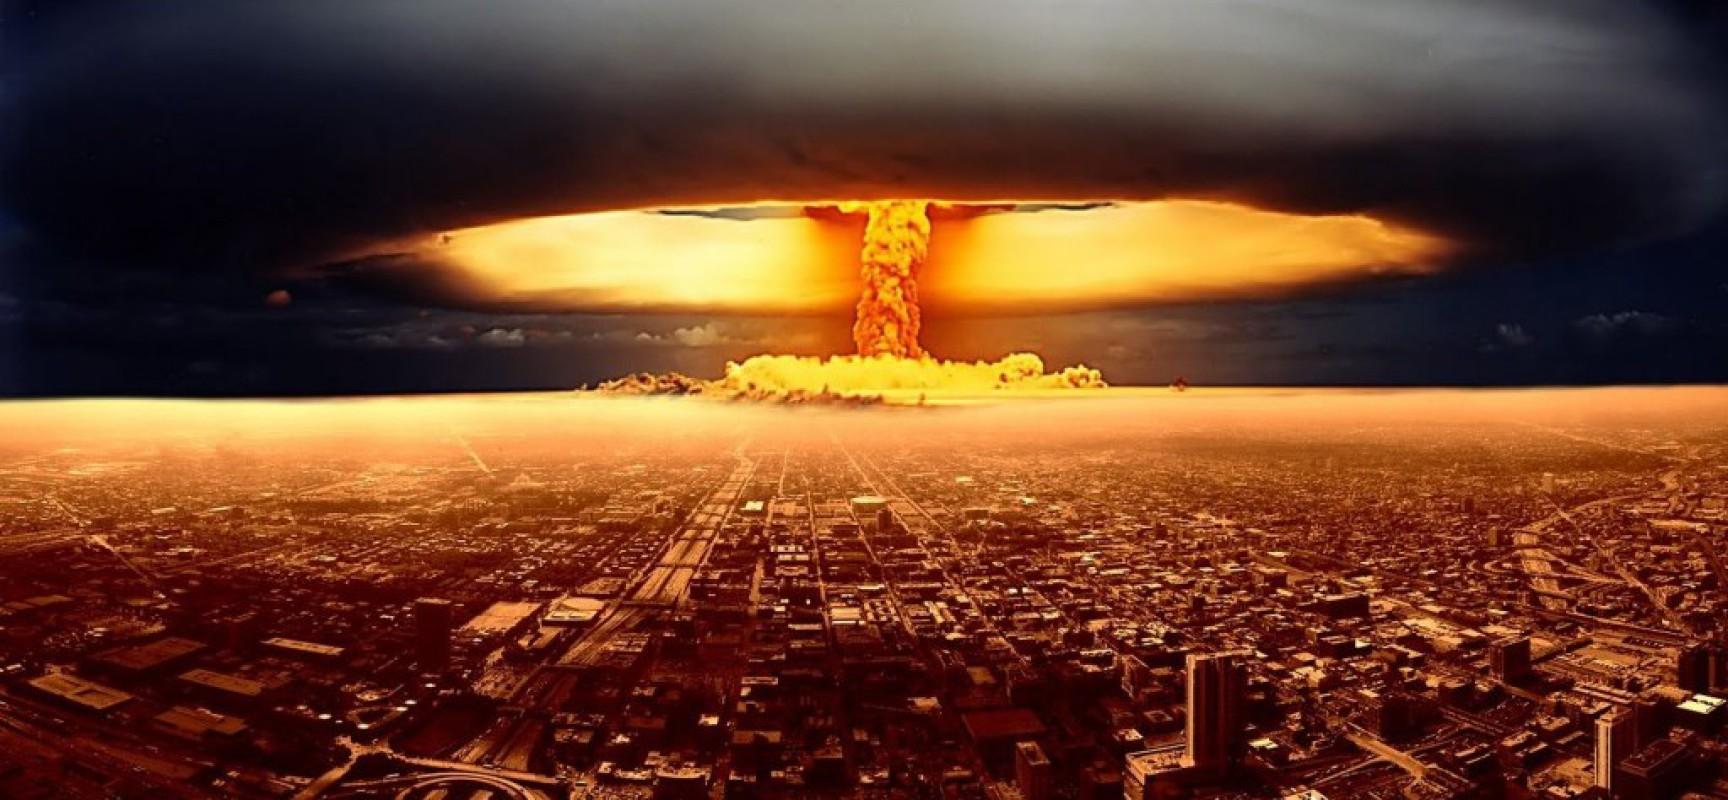 Nuclear-Explosion-HD-1024x640-1728x800_c